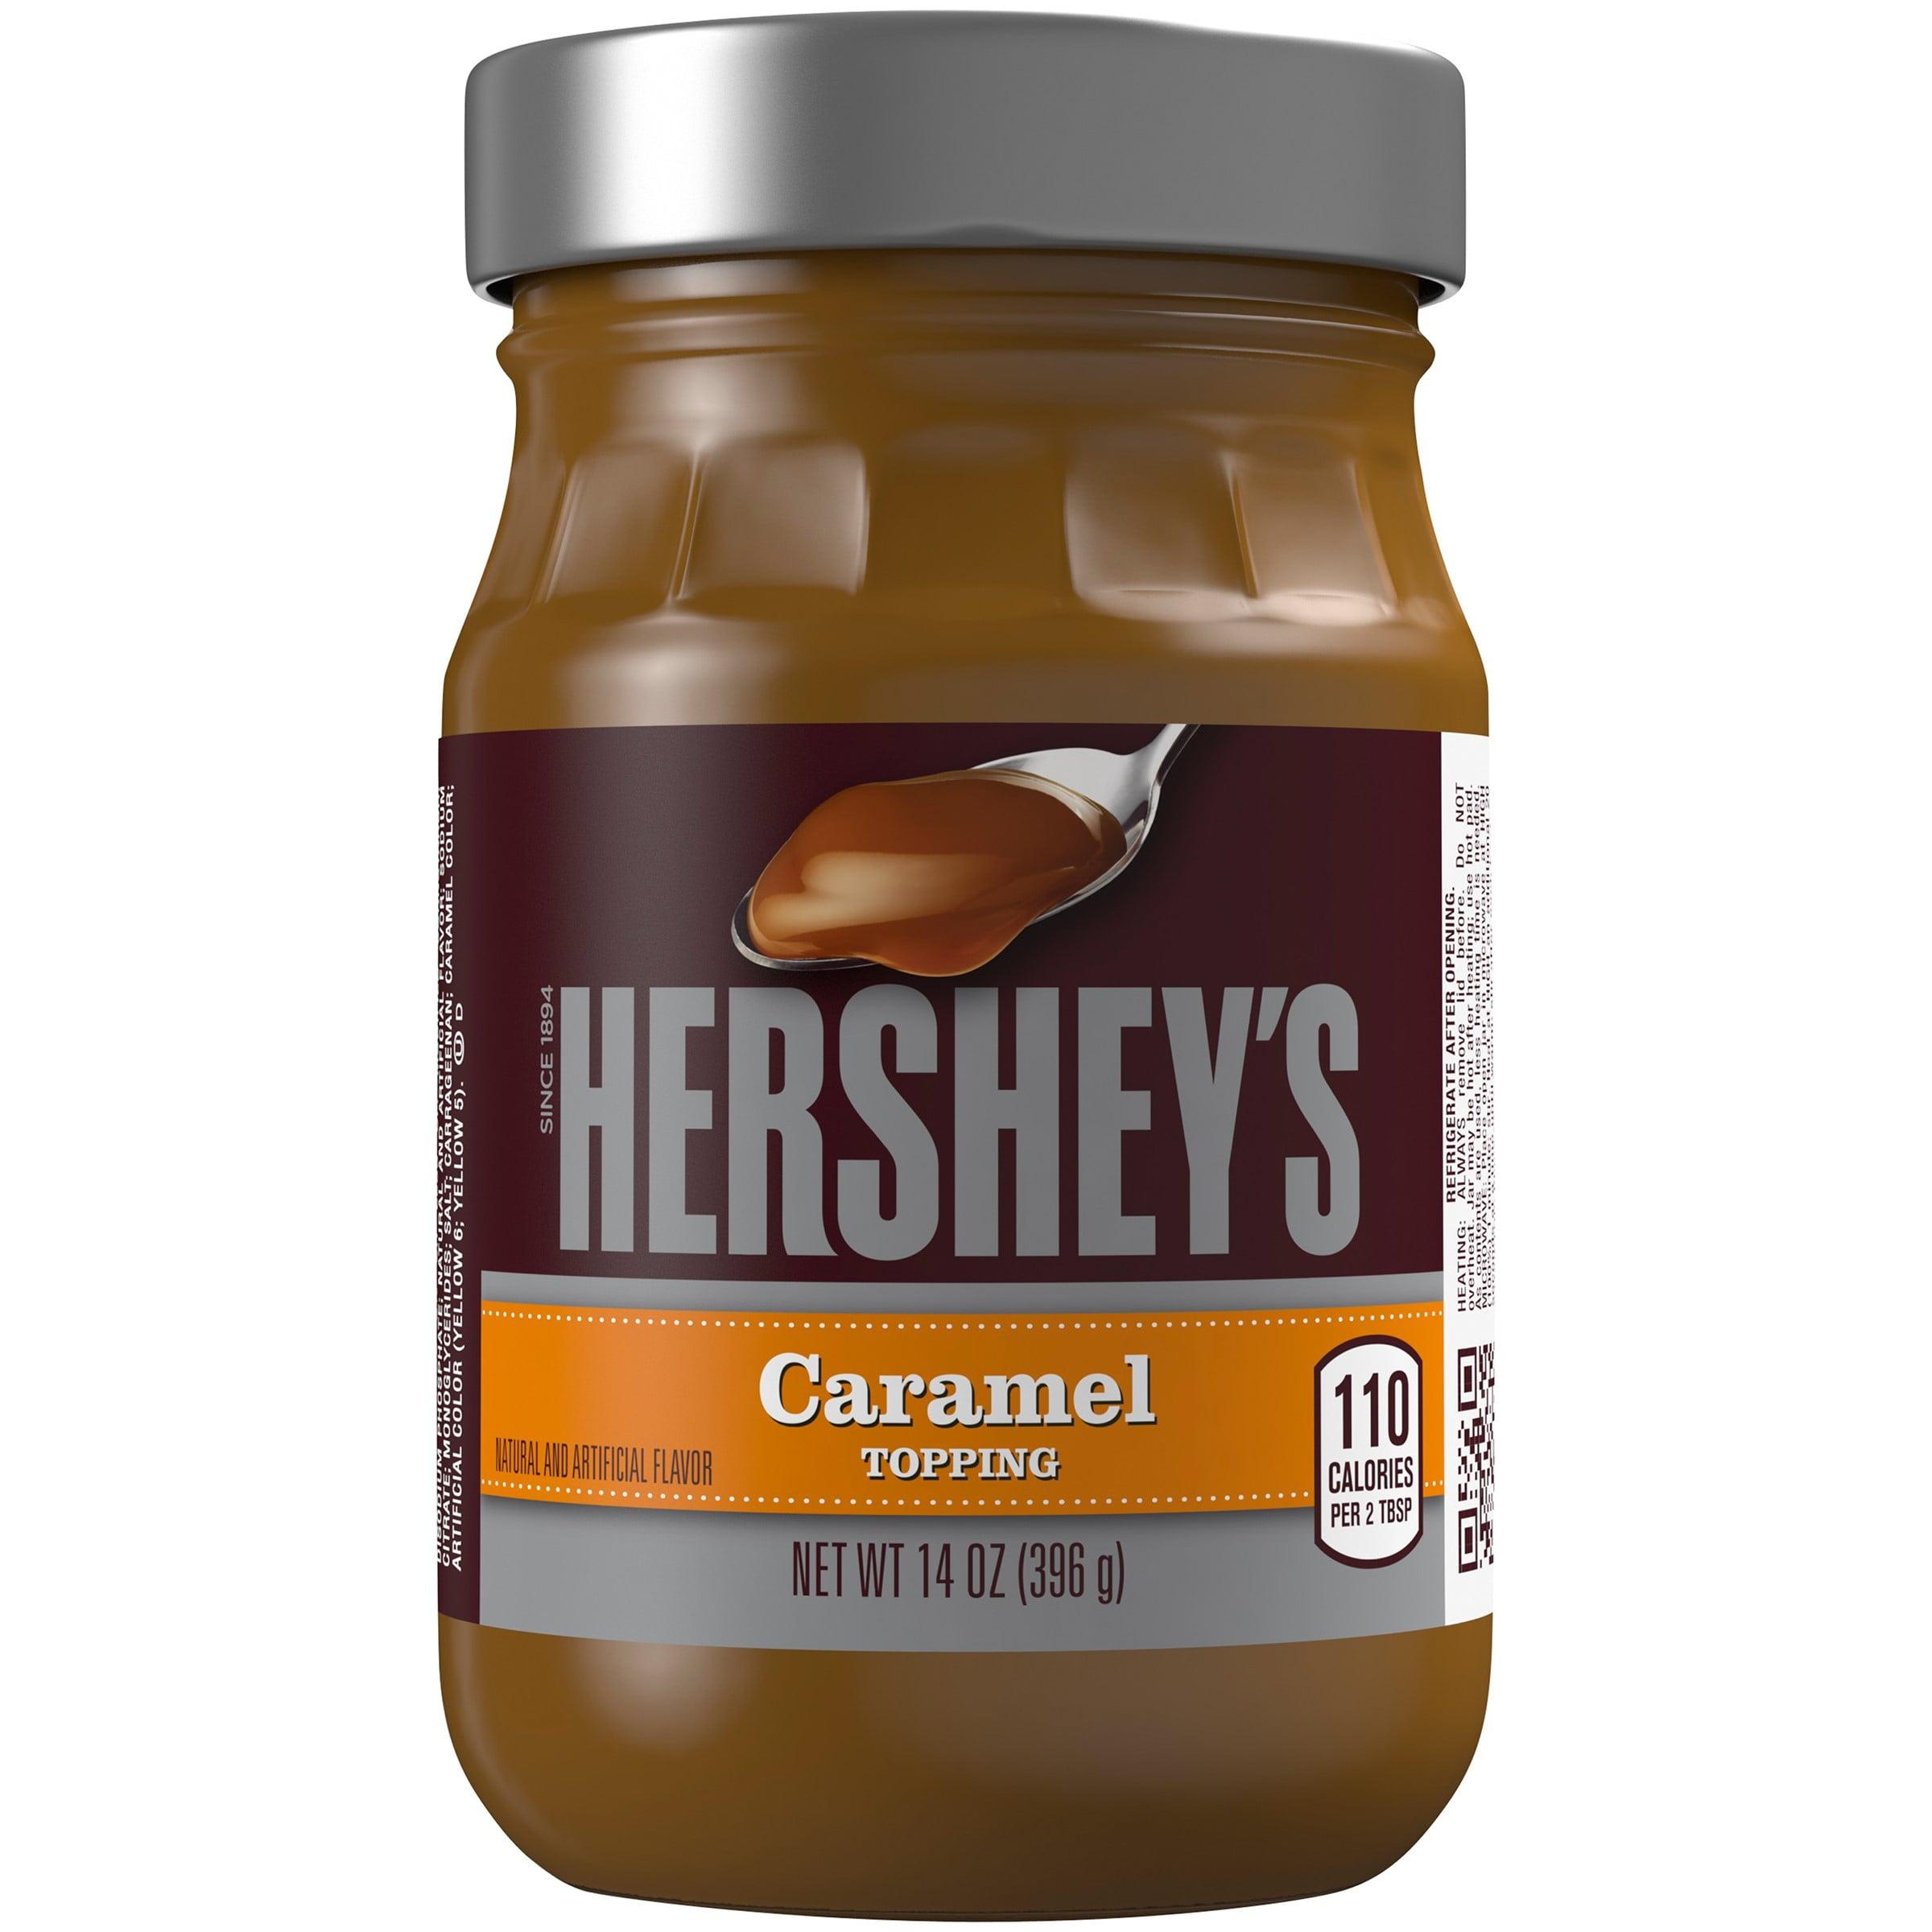 Hershey's, Caramel Topping, 14 Oz